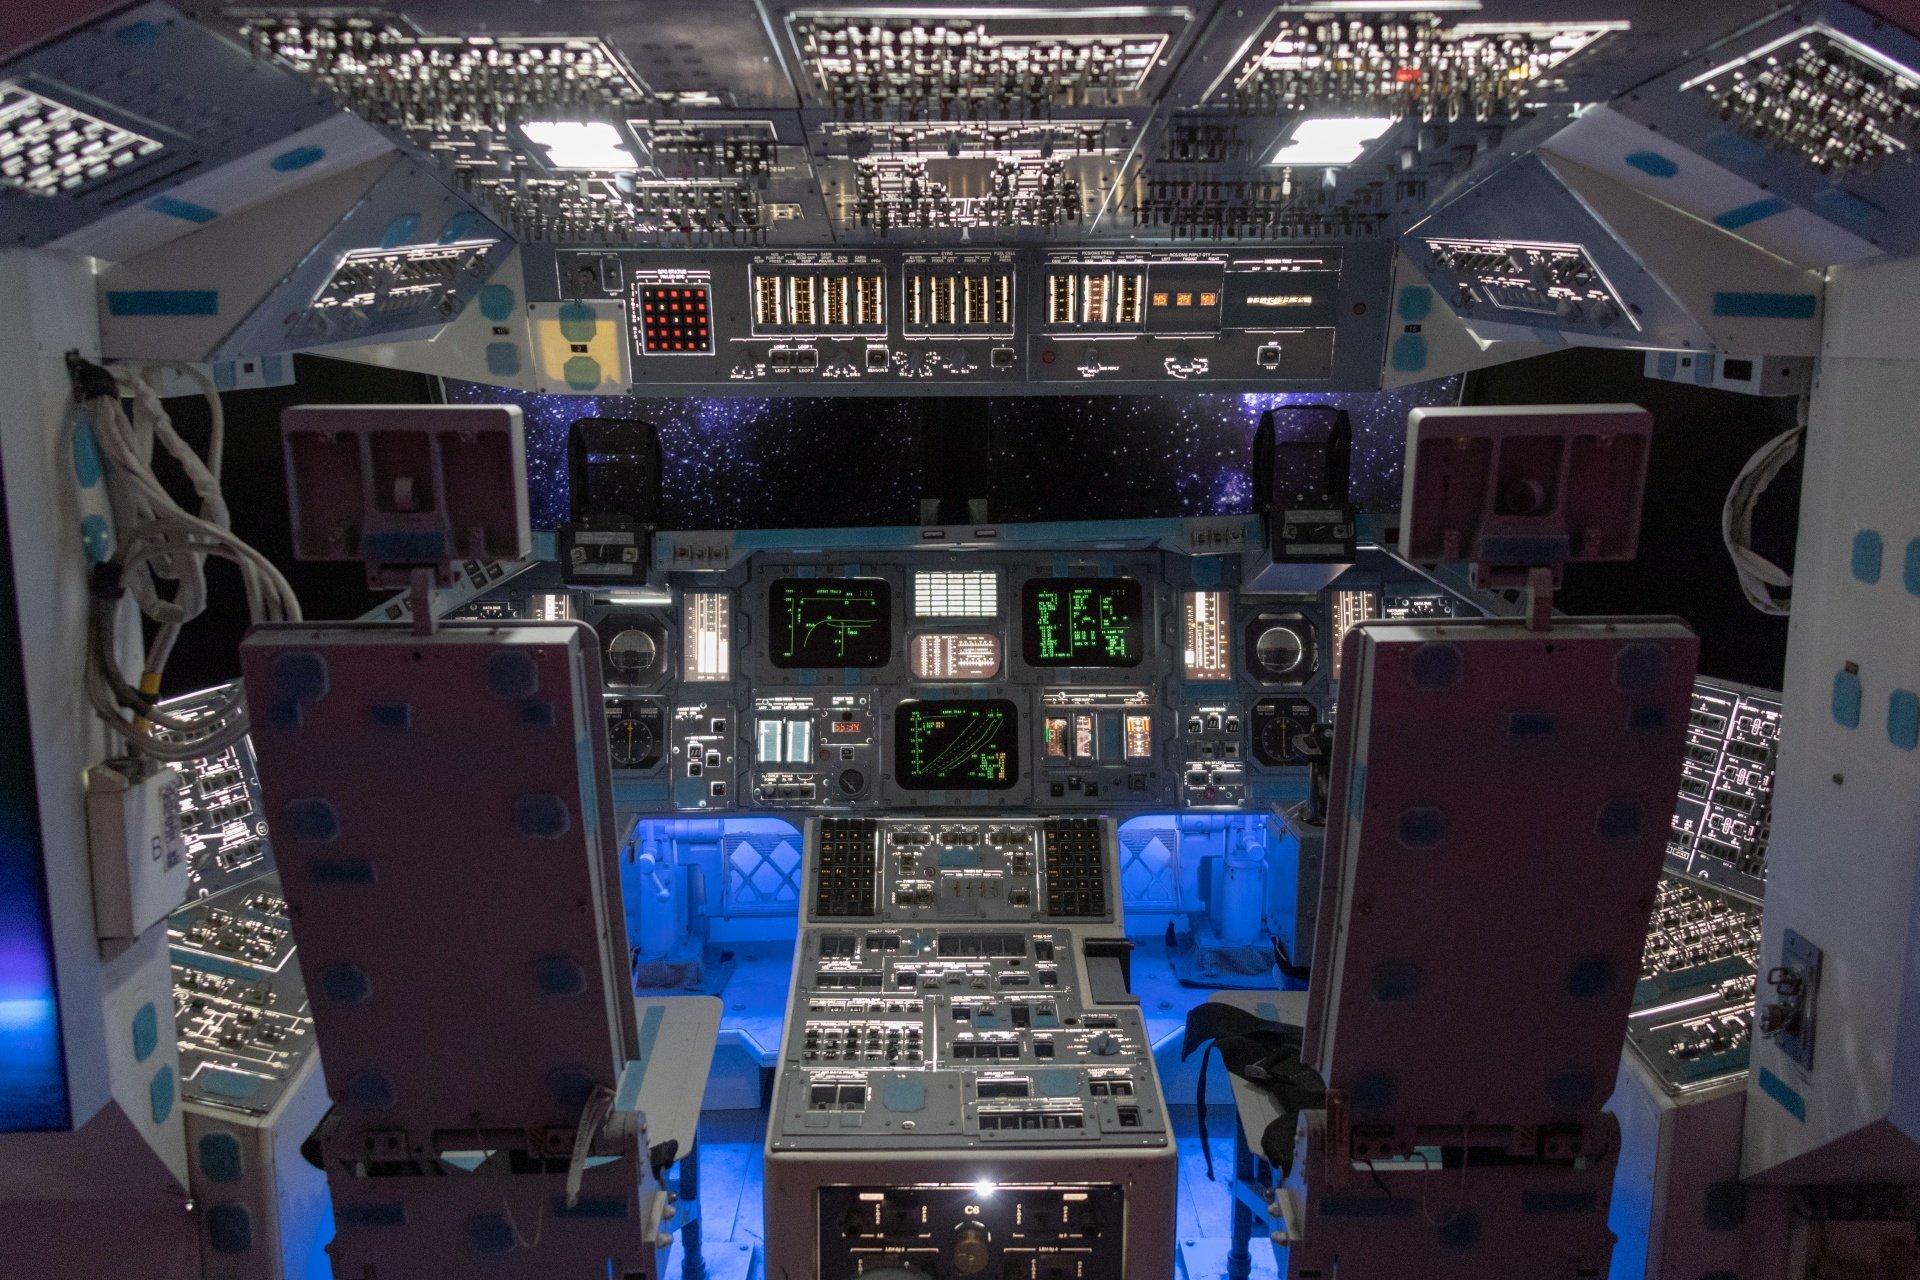 Mission Control Centre